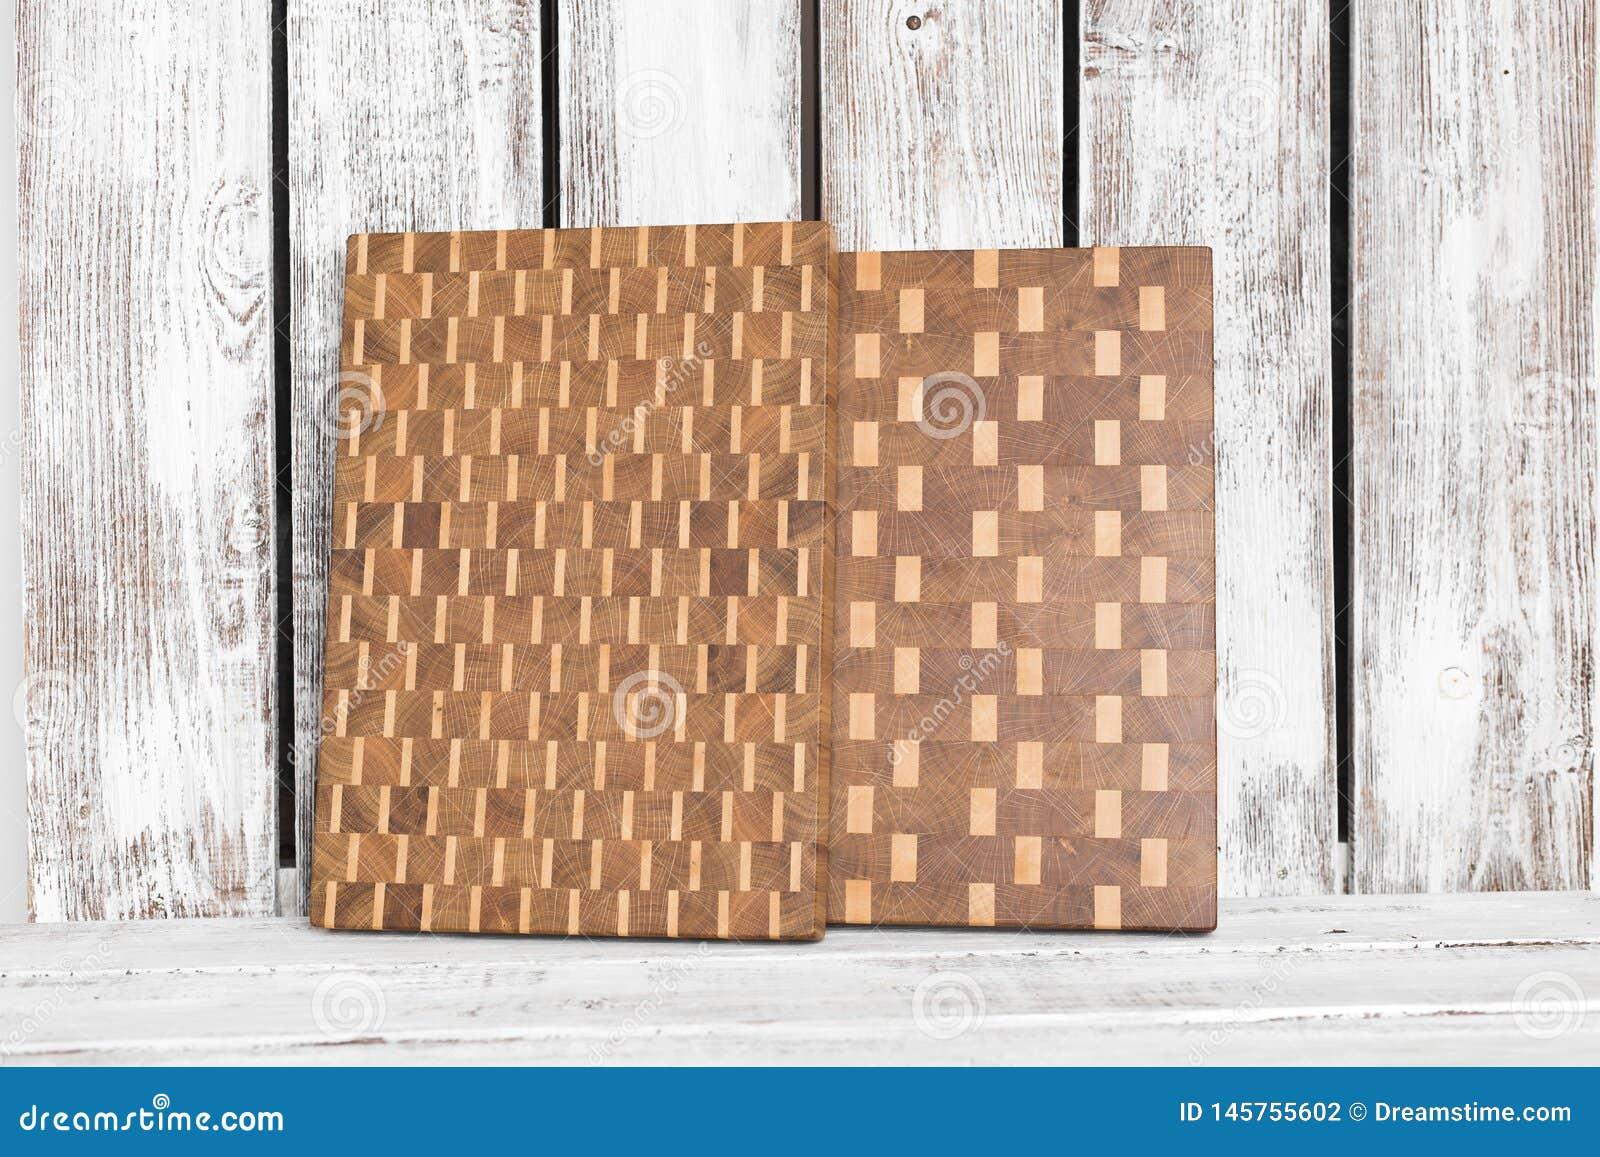 Fondo de la tabla de cortar de la cocina hecha del pedazo m?ltiple de bamb?